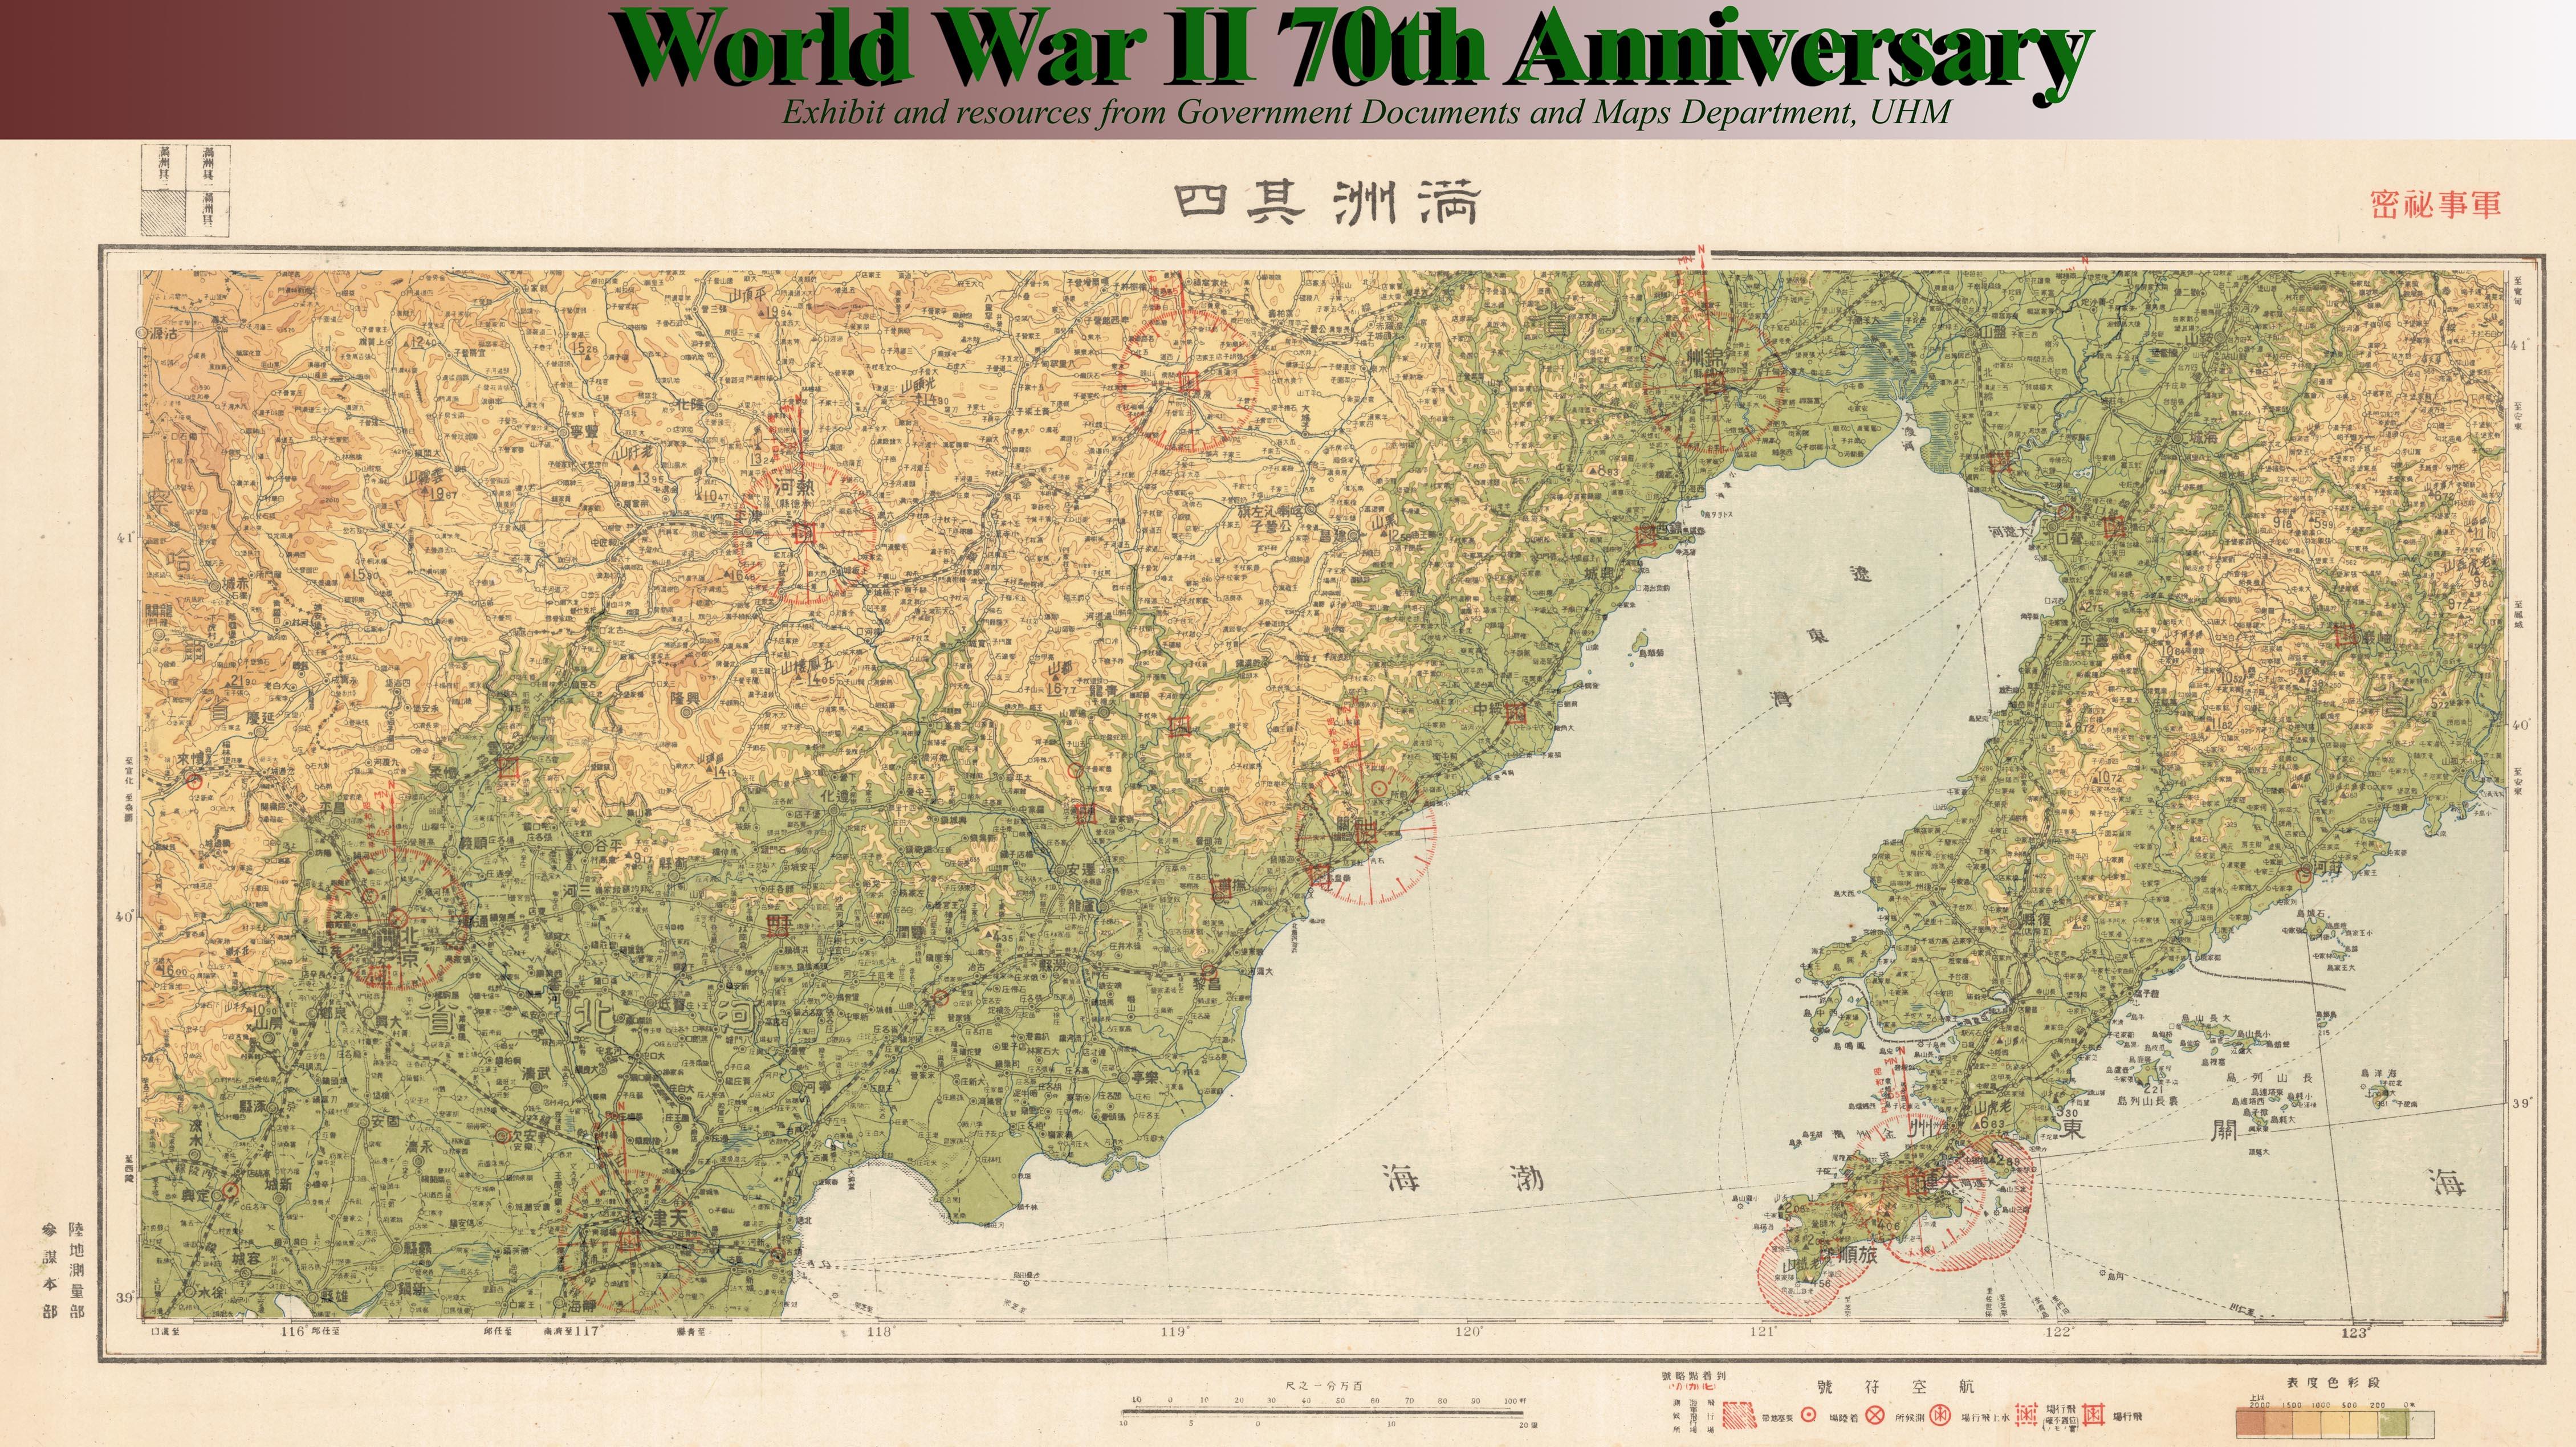 World War II 70th Anniversary - Maps, Aerial Photographs ... on map of greece ww2, map of libya ww2, map of russia ww2, map of netherlands ww2, map of france ww2, map of india ww2, map of new guinea ww2, map of belgium ww2, map of philippines ww2, map of japan ww2, map of poland ww2, map of pacific battles ww2, map of asia after ww2, map of the pacific ww2, map of hiroshima ww2, map of iwo jima ww2, map of germany ww2, map of vietnam ww2, map of china ww2, map of tobruk ww2,